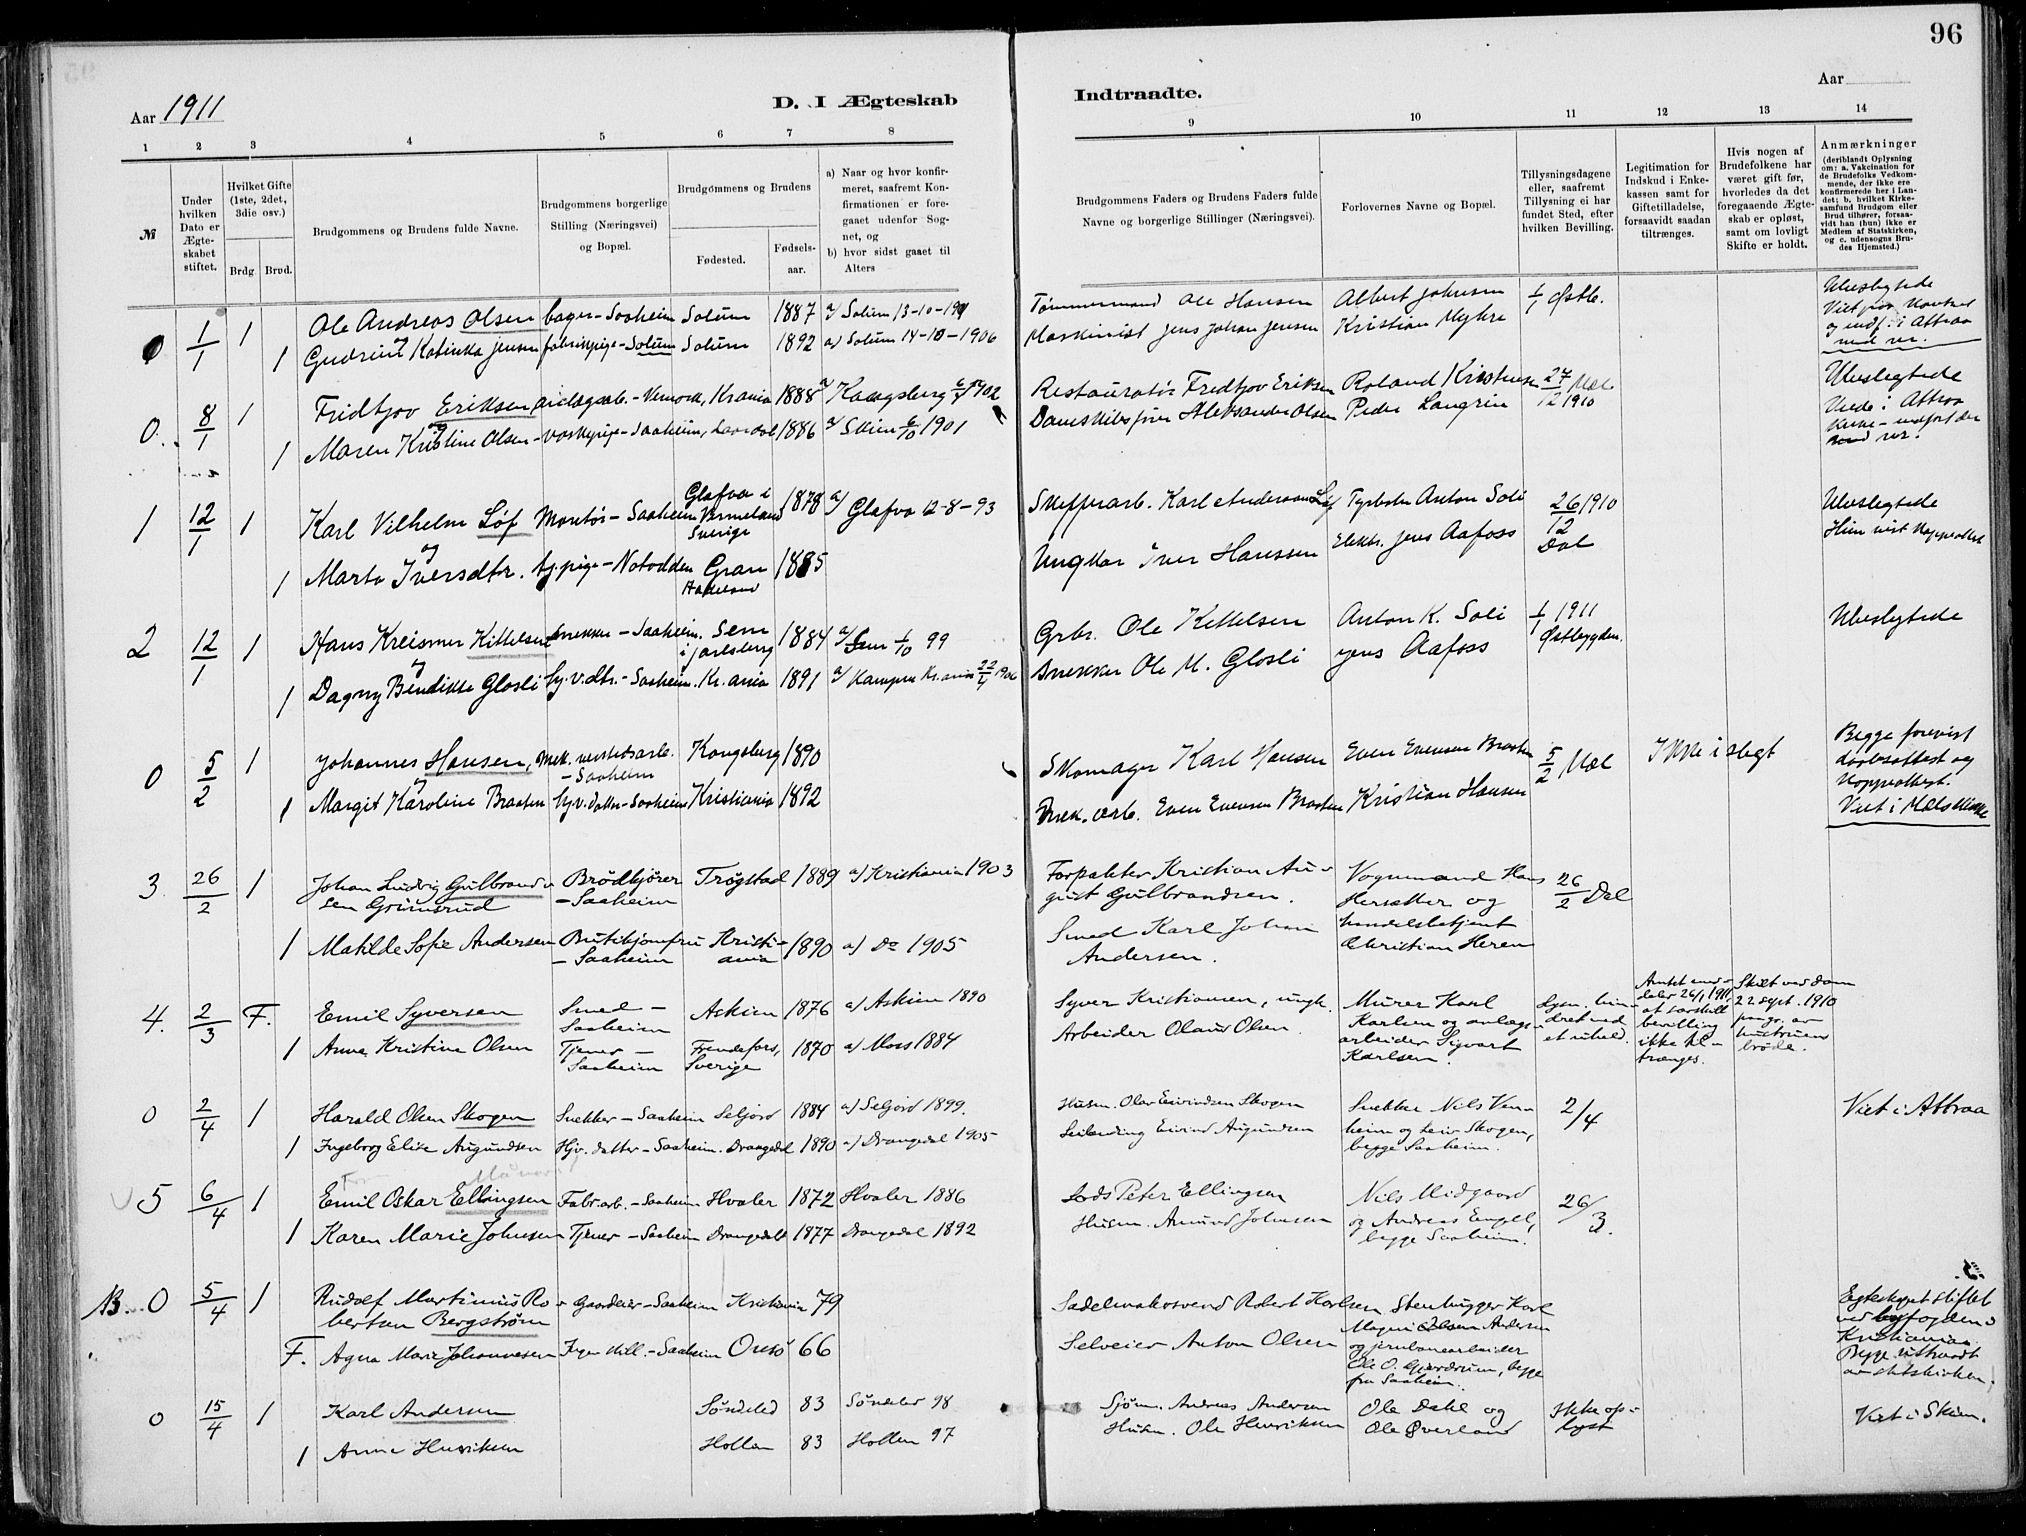 SAKO, Rjukan kirkebøker, F/Fa/L0001: Ministerialbok nr. 1, 1878-1912, s. 96